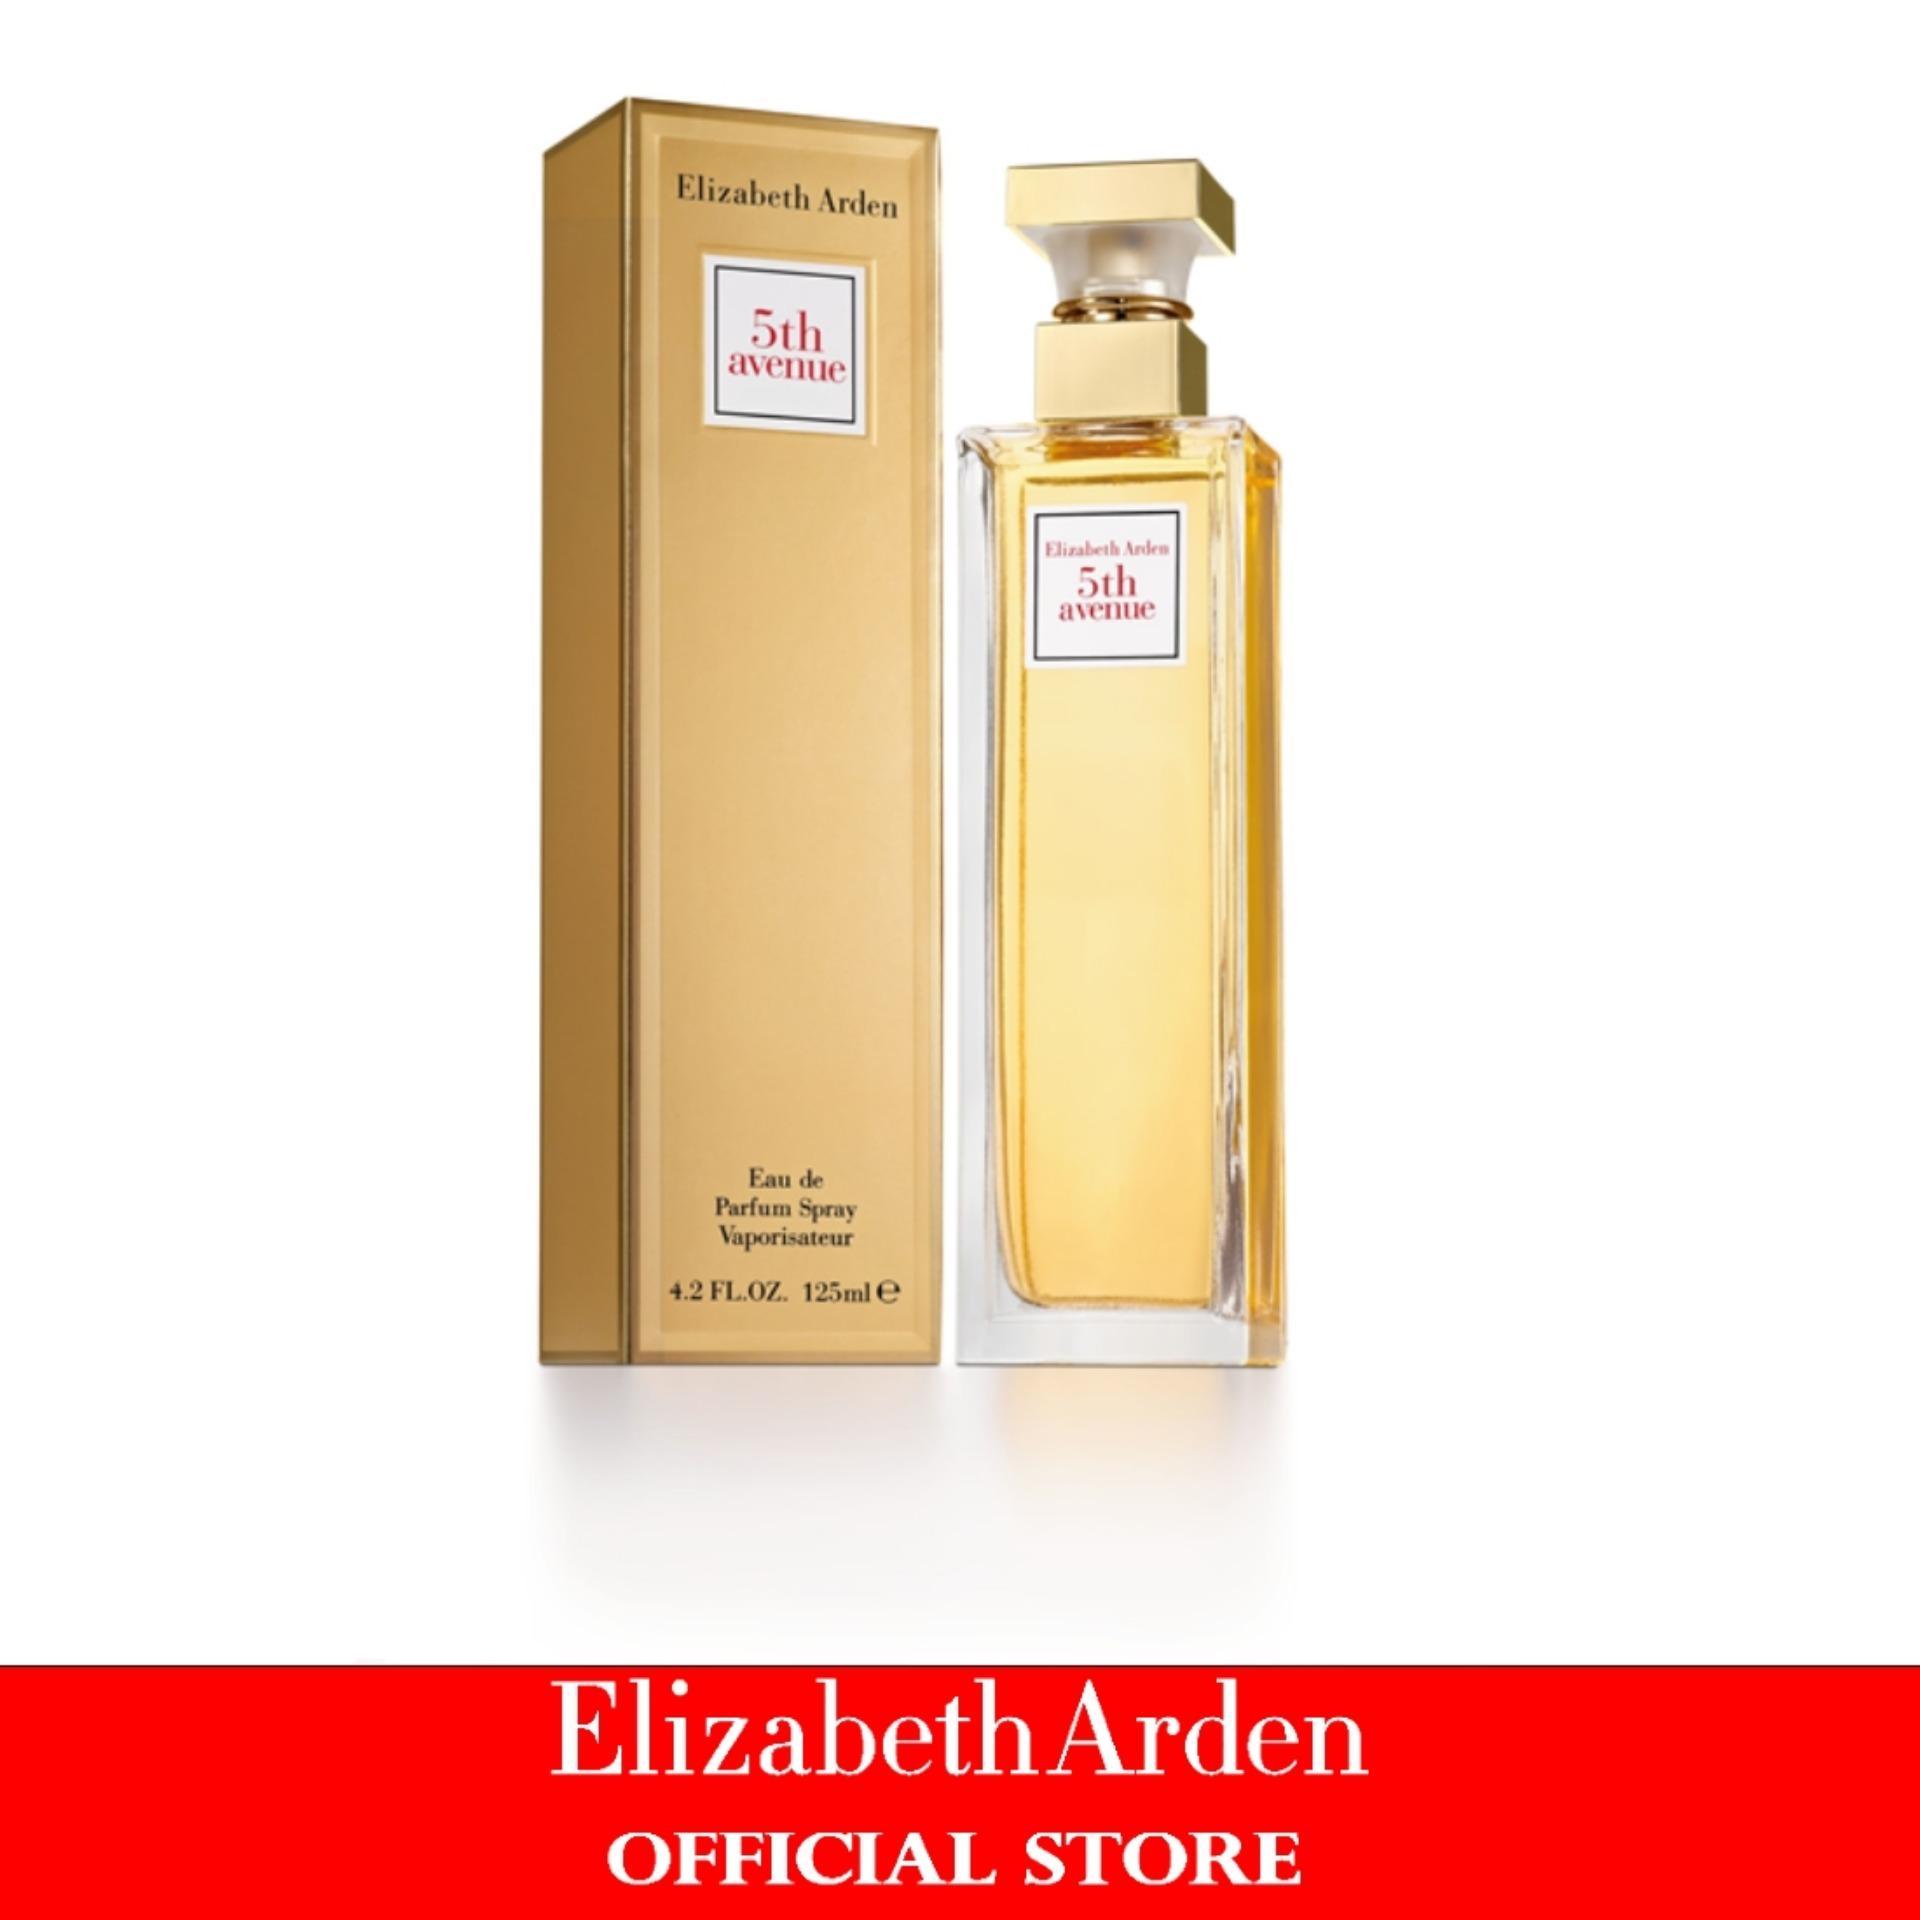 Price Comparisons Of Elizabeth Arden Fifth Avenue Eau De Parfum Spray 4 2 Oz